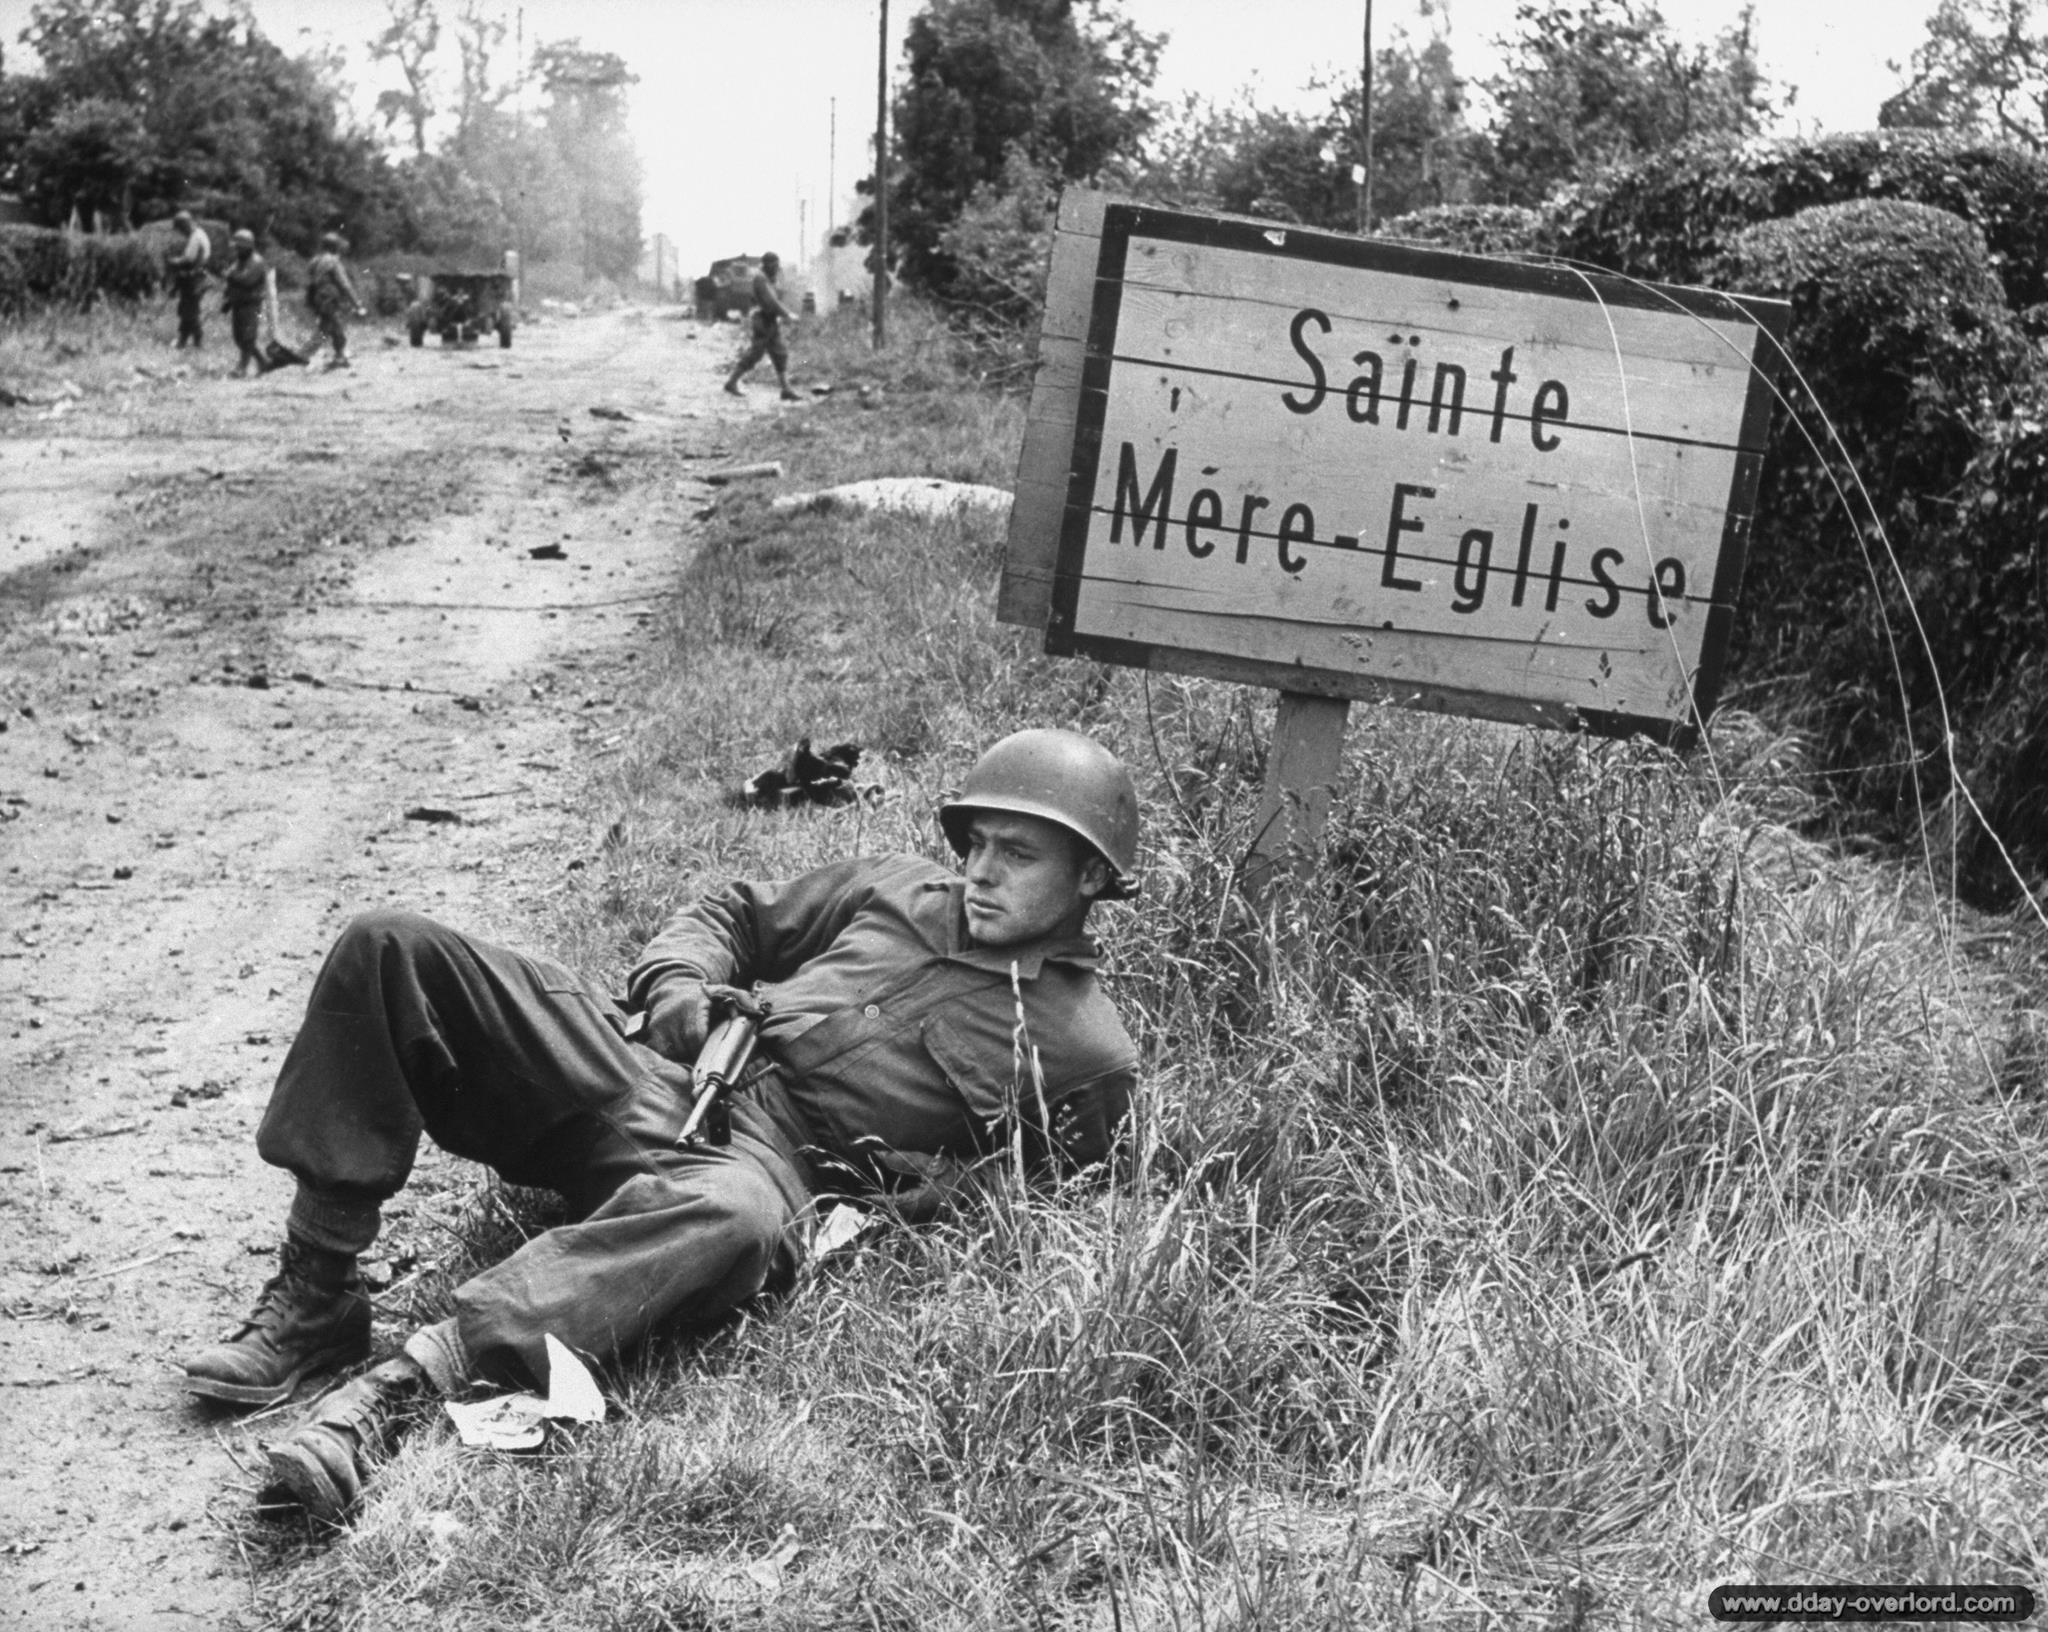 82nd_airborne_division_sainte_mere_eglise_elmer_habbs